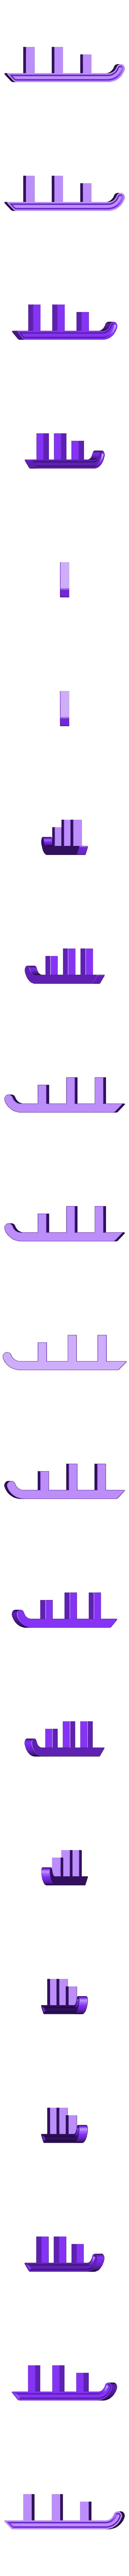 SLEIGH SKI.stl Download free STL file Santa Sleigh • Object to 3D print, 3DPrintersaur